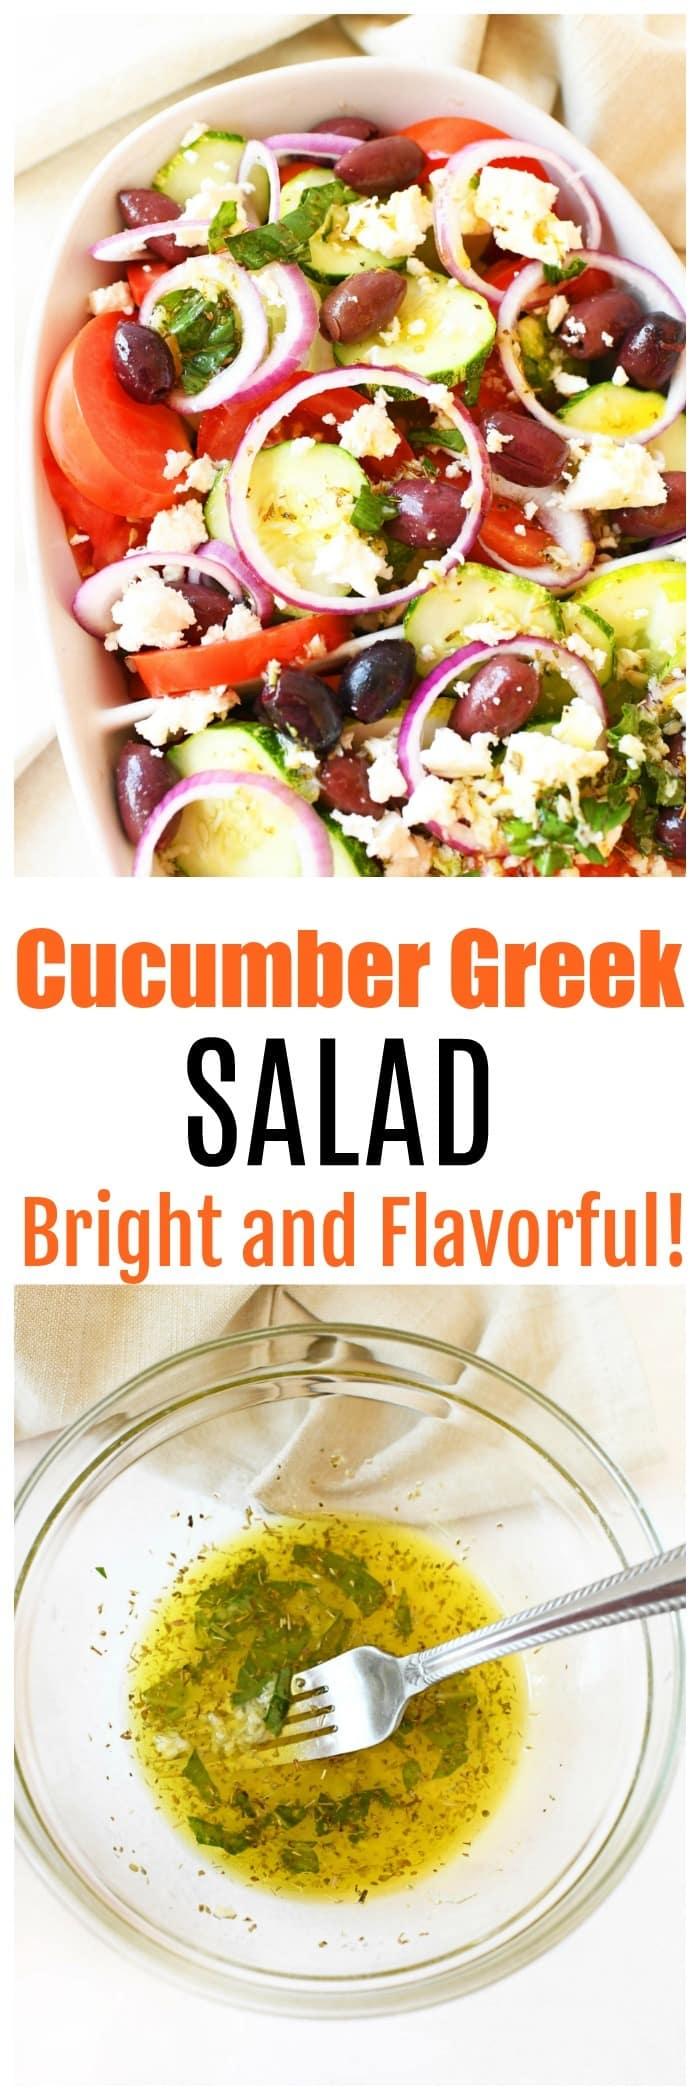 Fresh Greek Cucumber Salad (Bright and Flavorful!)